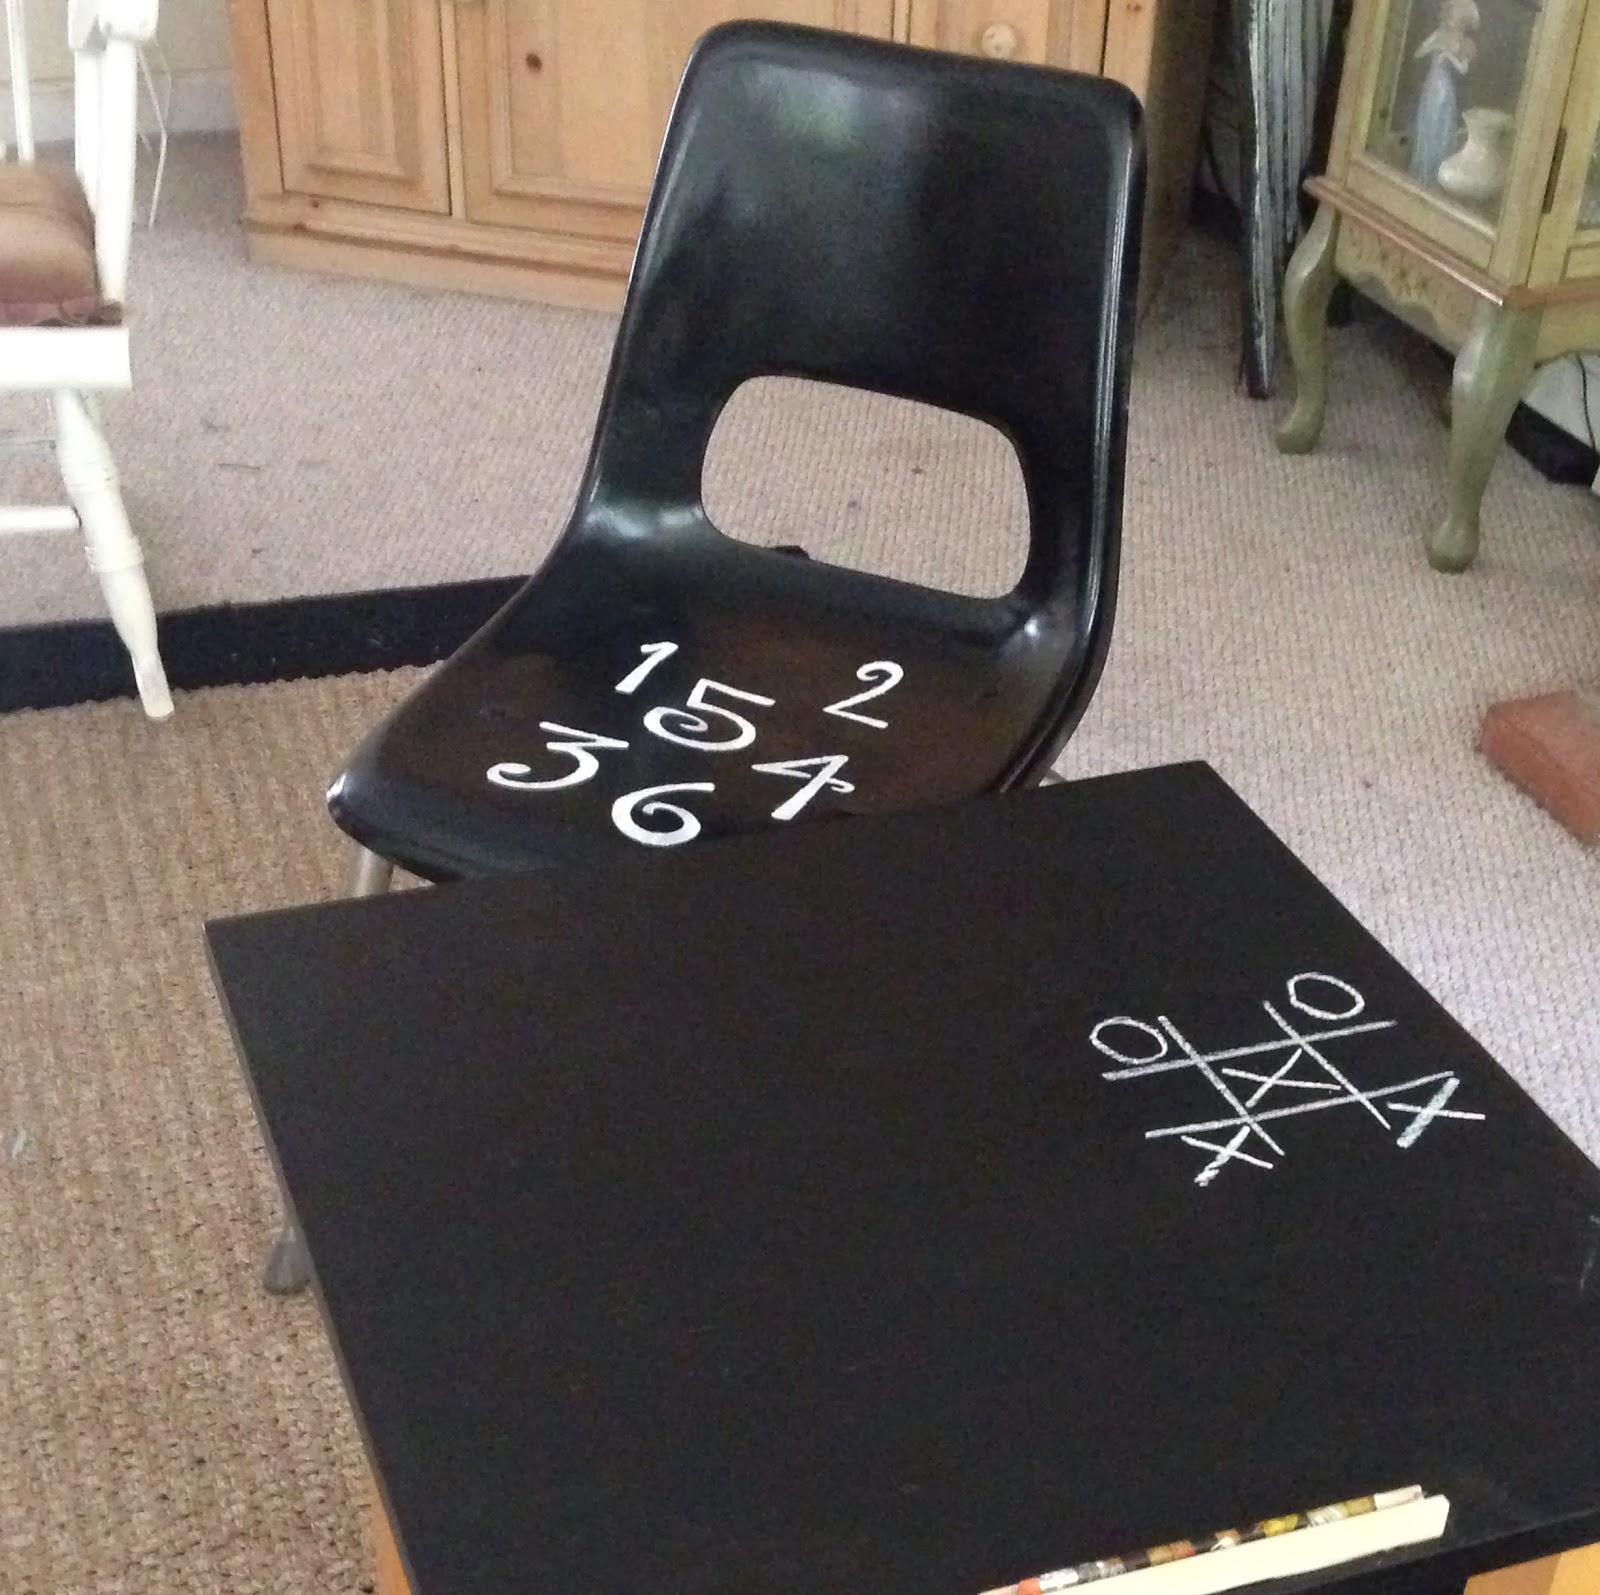 Child's Chalkboard Desk & Chair Finished